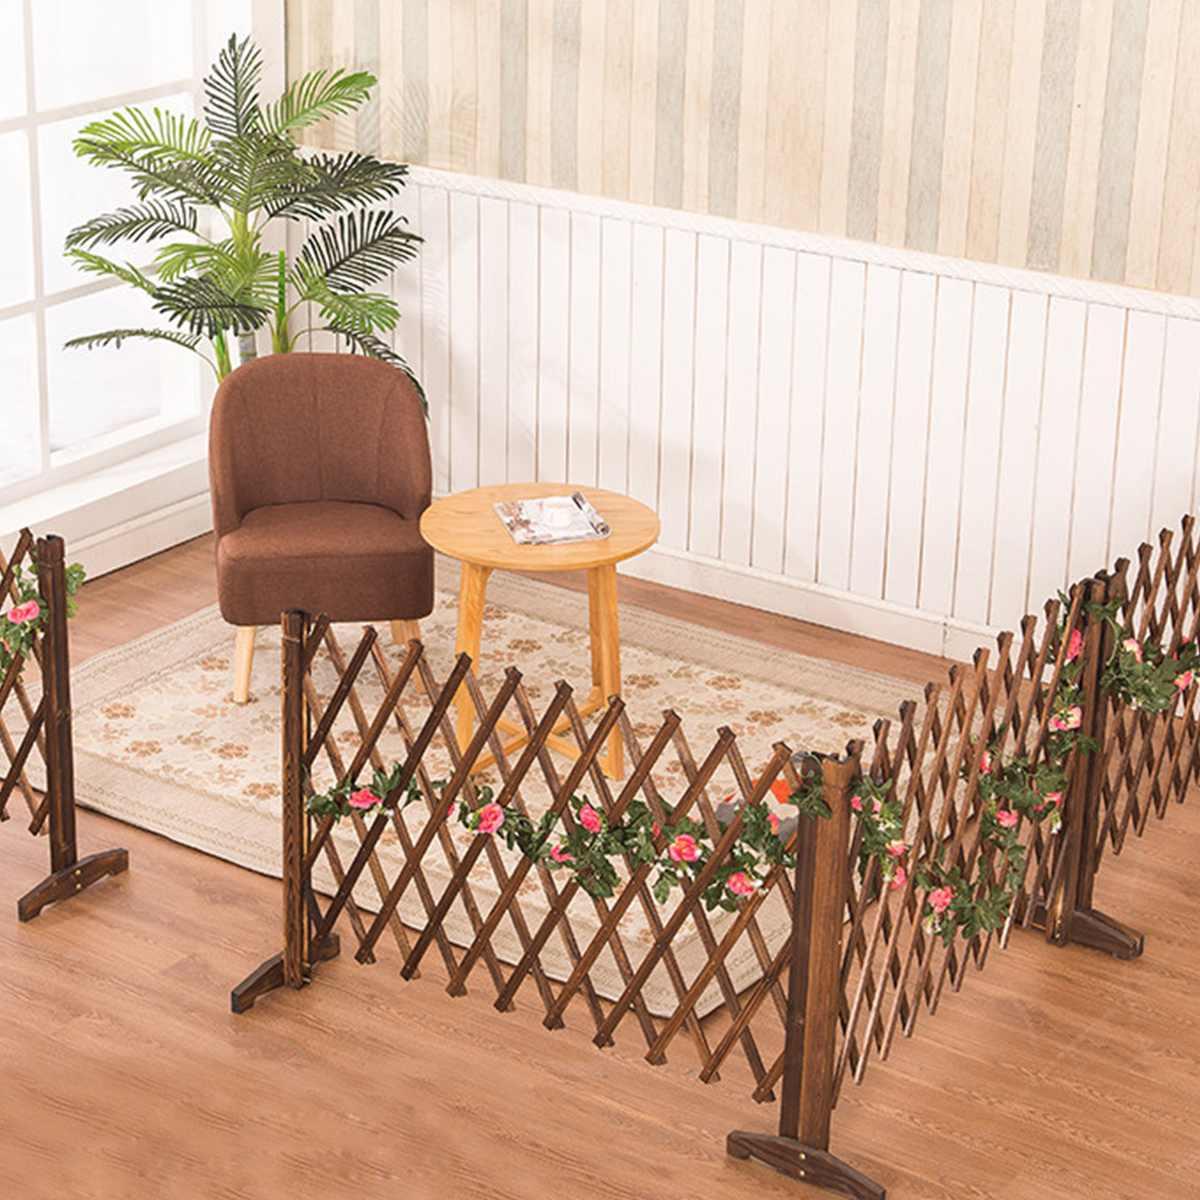 Expanding Wooden Garden Wall Fence Panel Plant Climb Trellis partition Decorative Garden Fence for Home Yard Garden Decoration